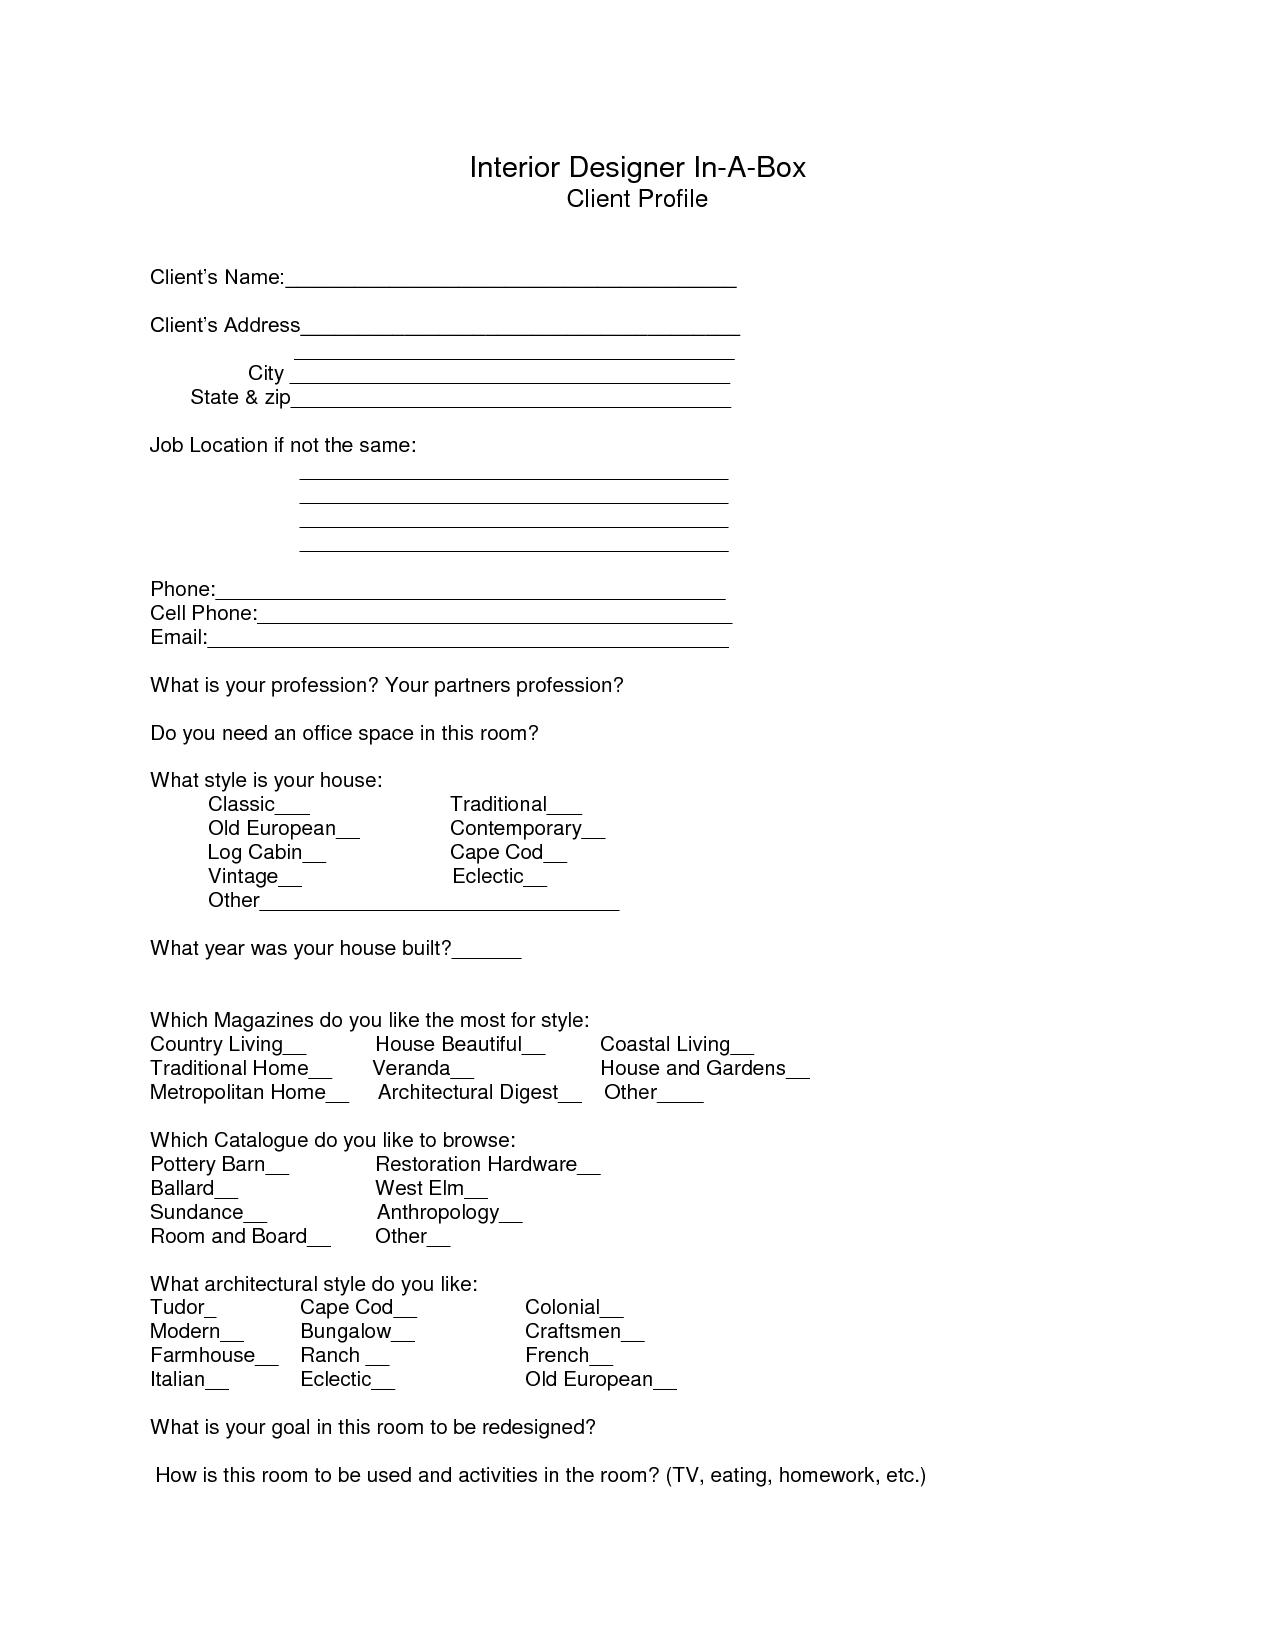 questionnaire for interior design clients ...